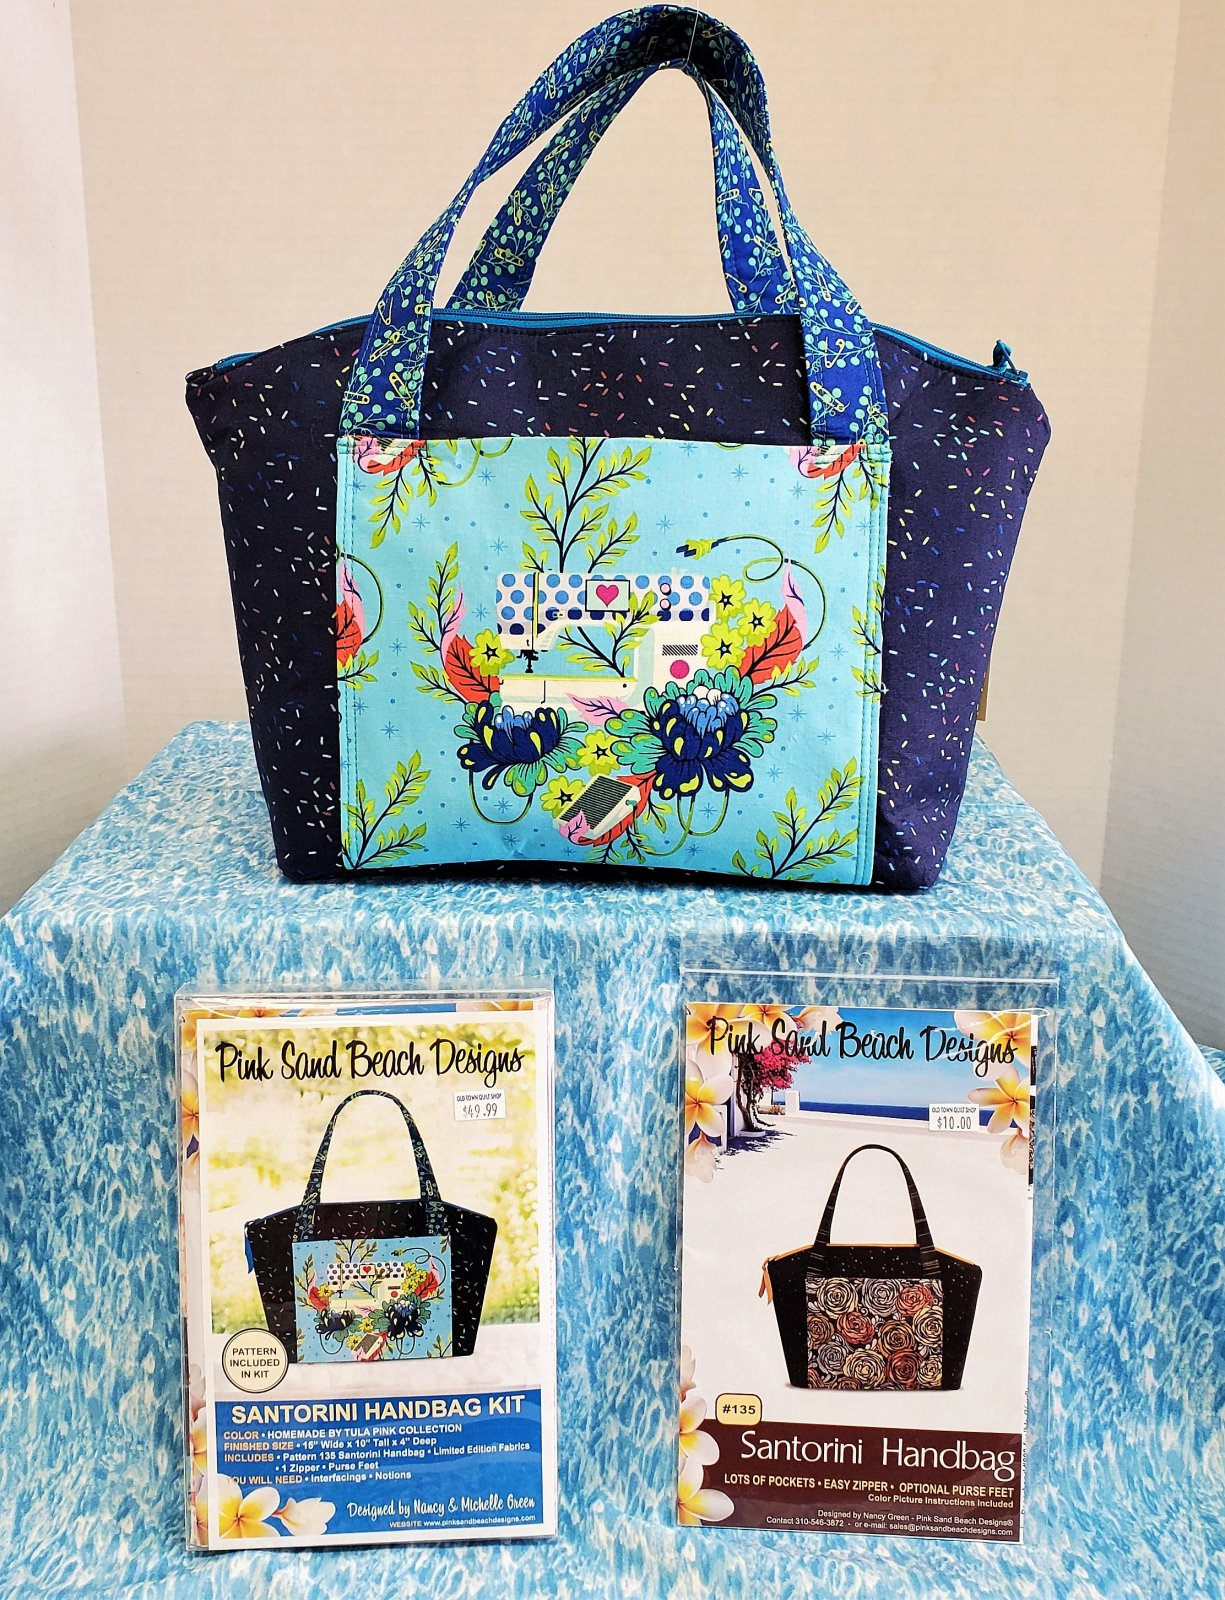 Santorini Handbag KIT - Tula Pink